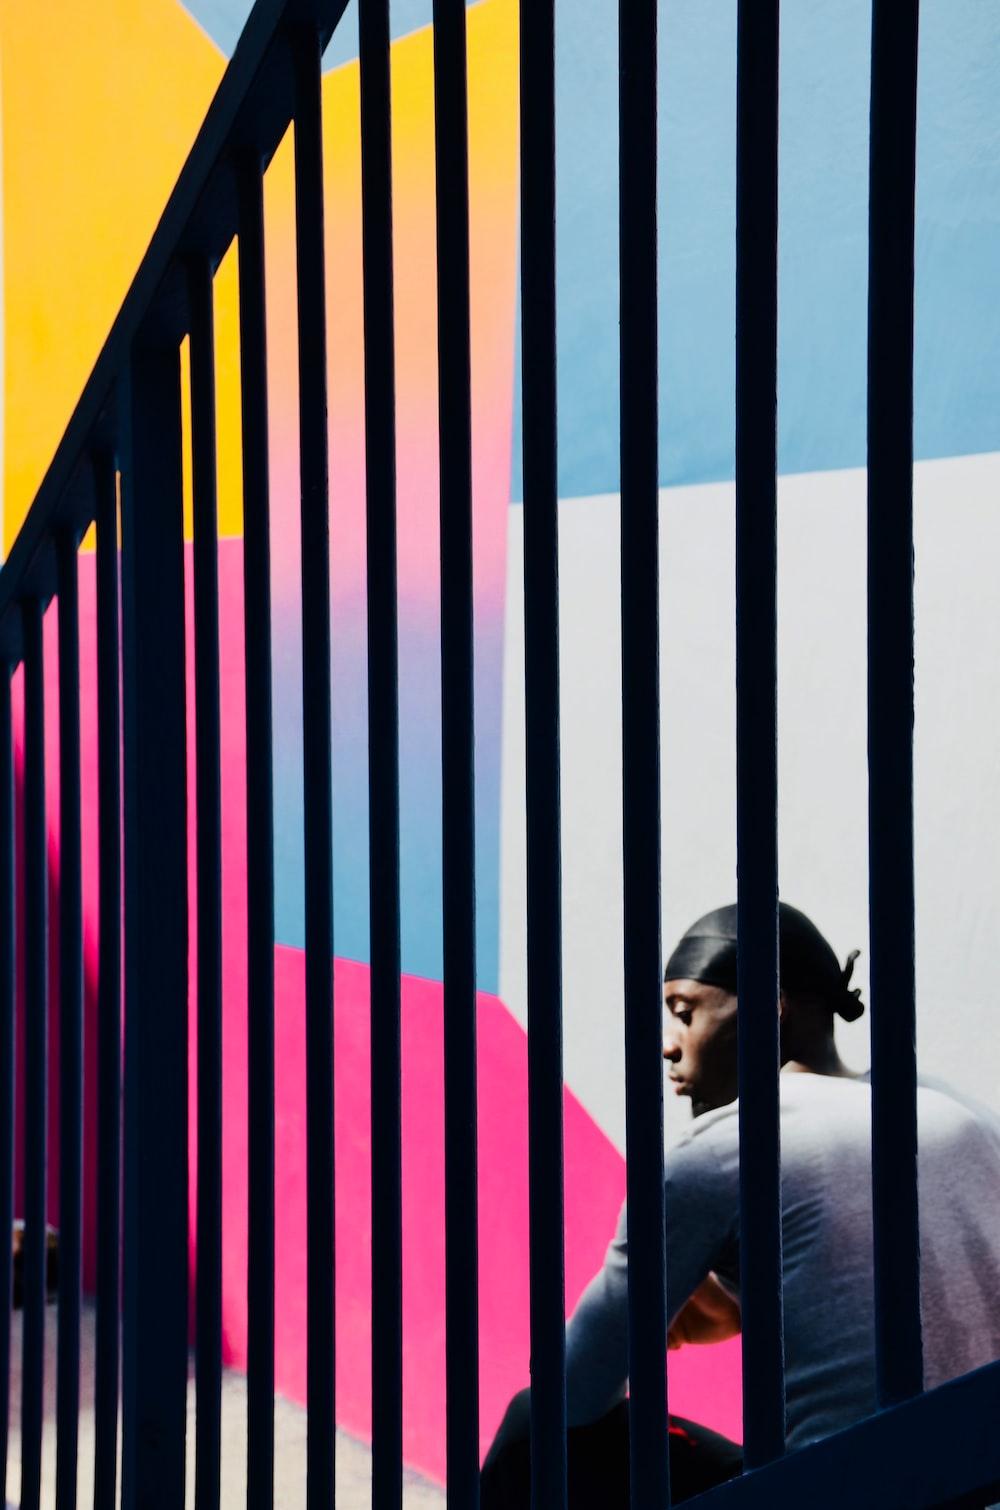 man sitting beside railing